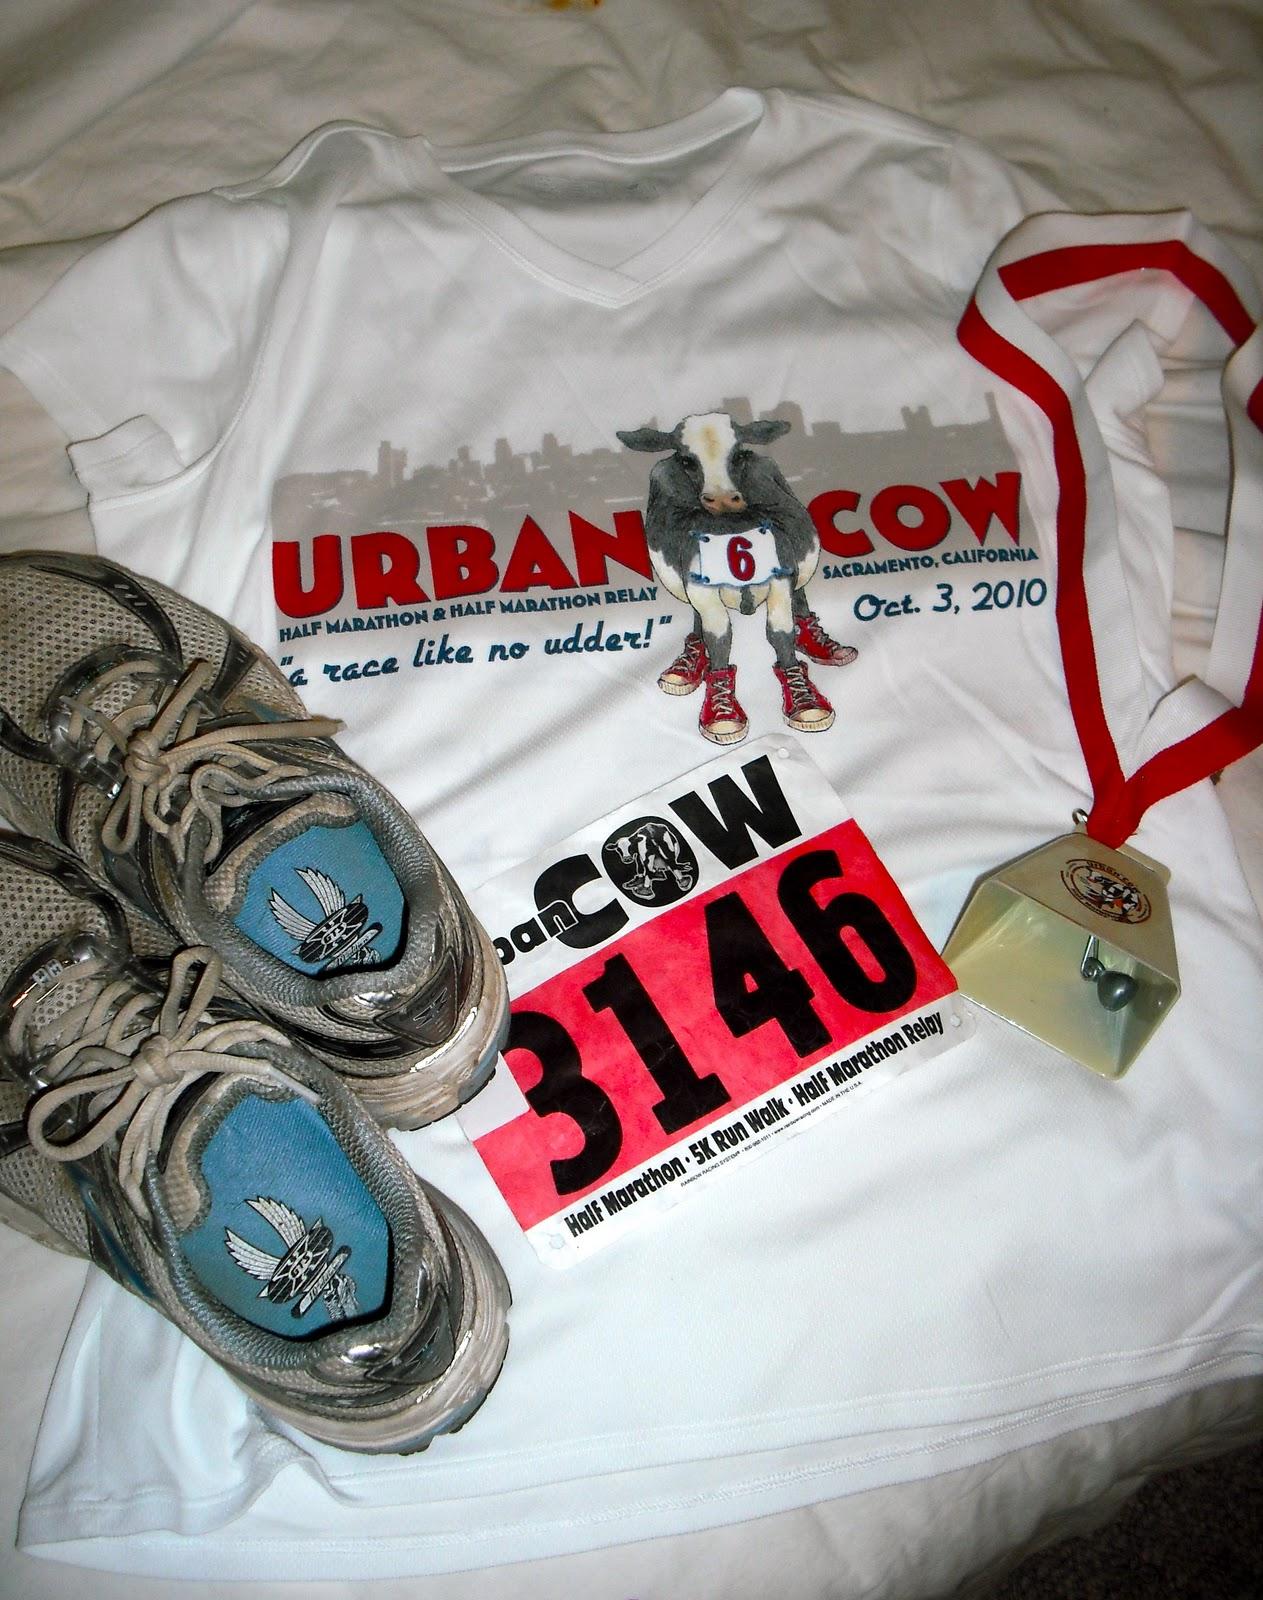 make a run for it: Urban Cow Half Marathon (Race Report)